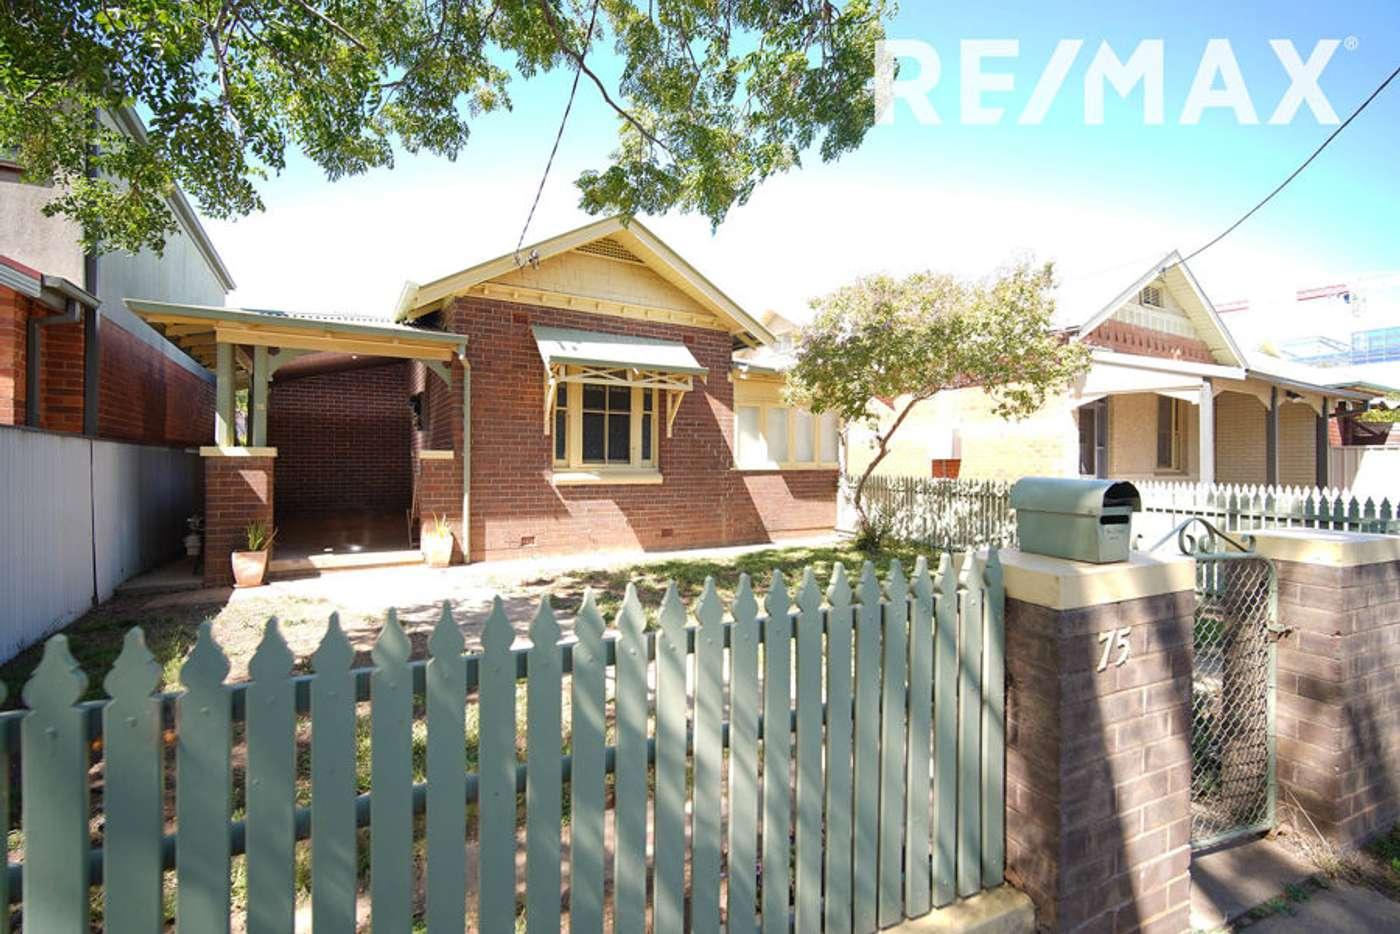 Main view of Homely house listing, 75 Docker Street, Wagga Wagga NSW 2650